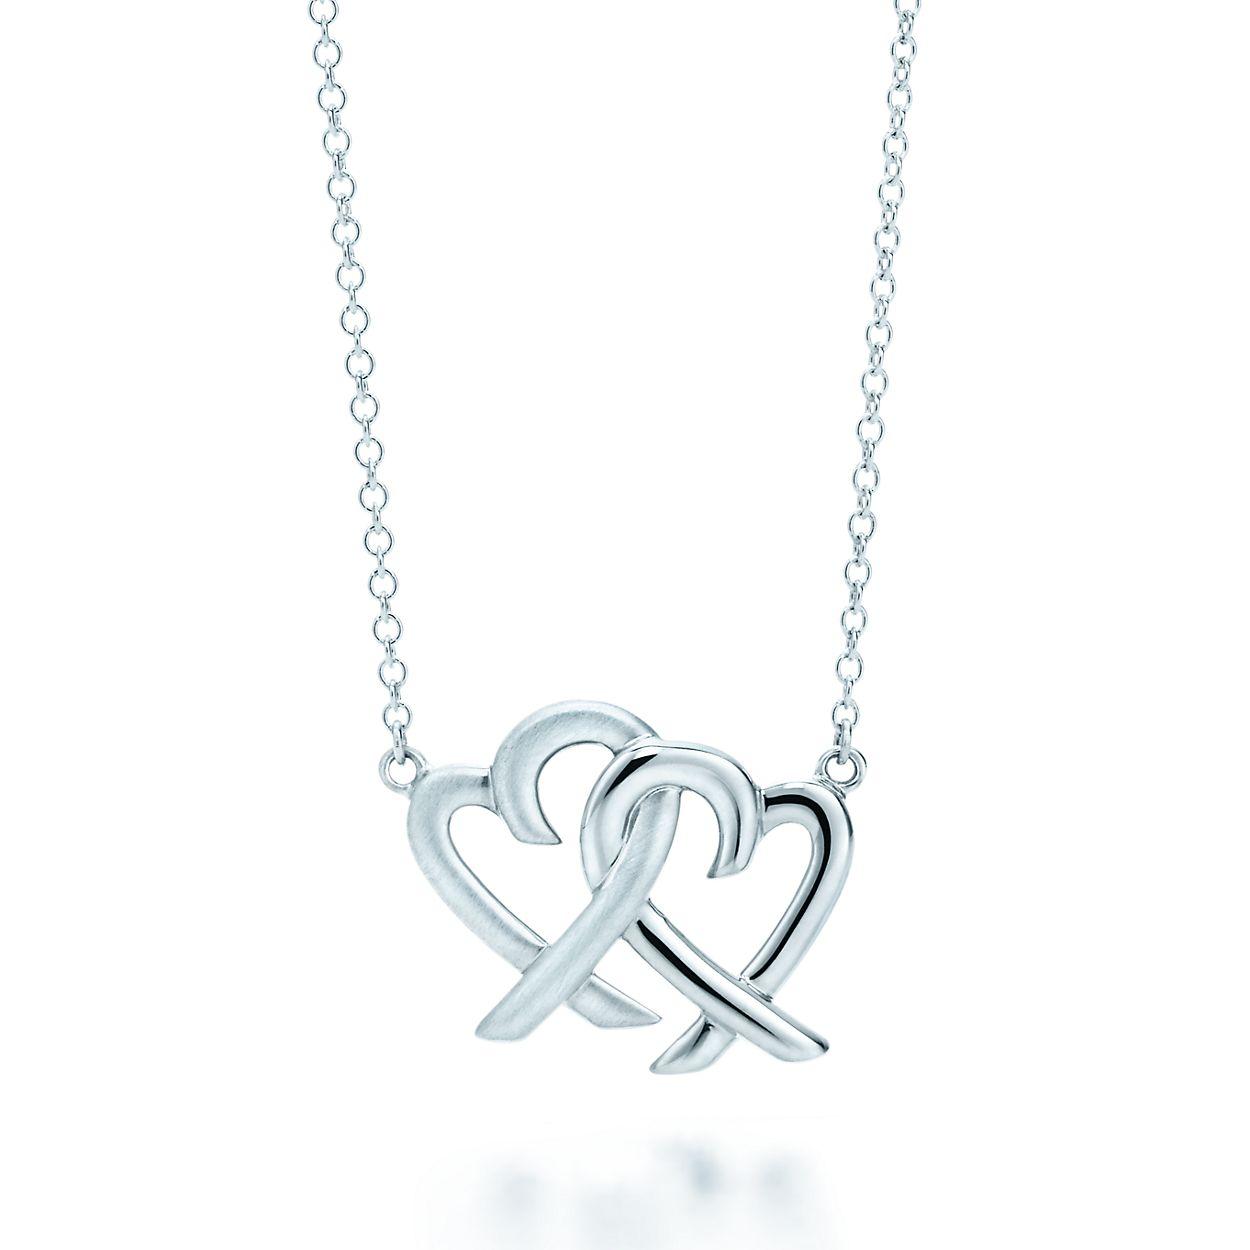 Paloma Picasso Loving Heart interlocking pendant in sterling silver Tiffany & Co. 4I1eQBd